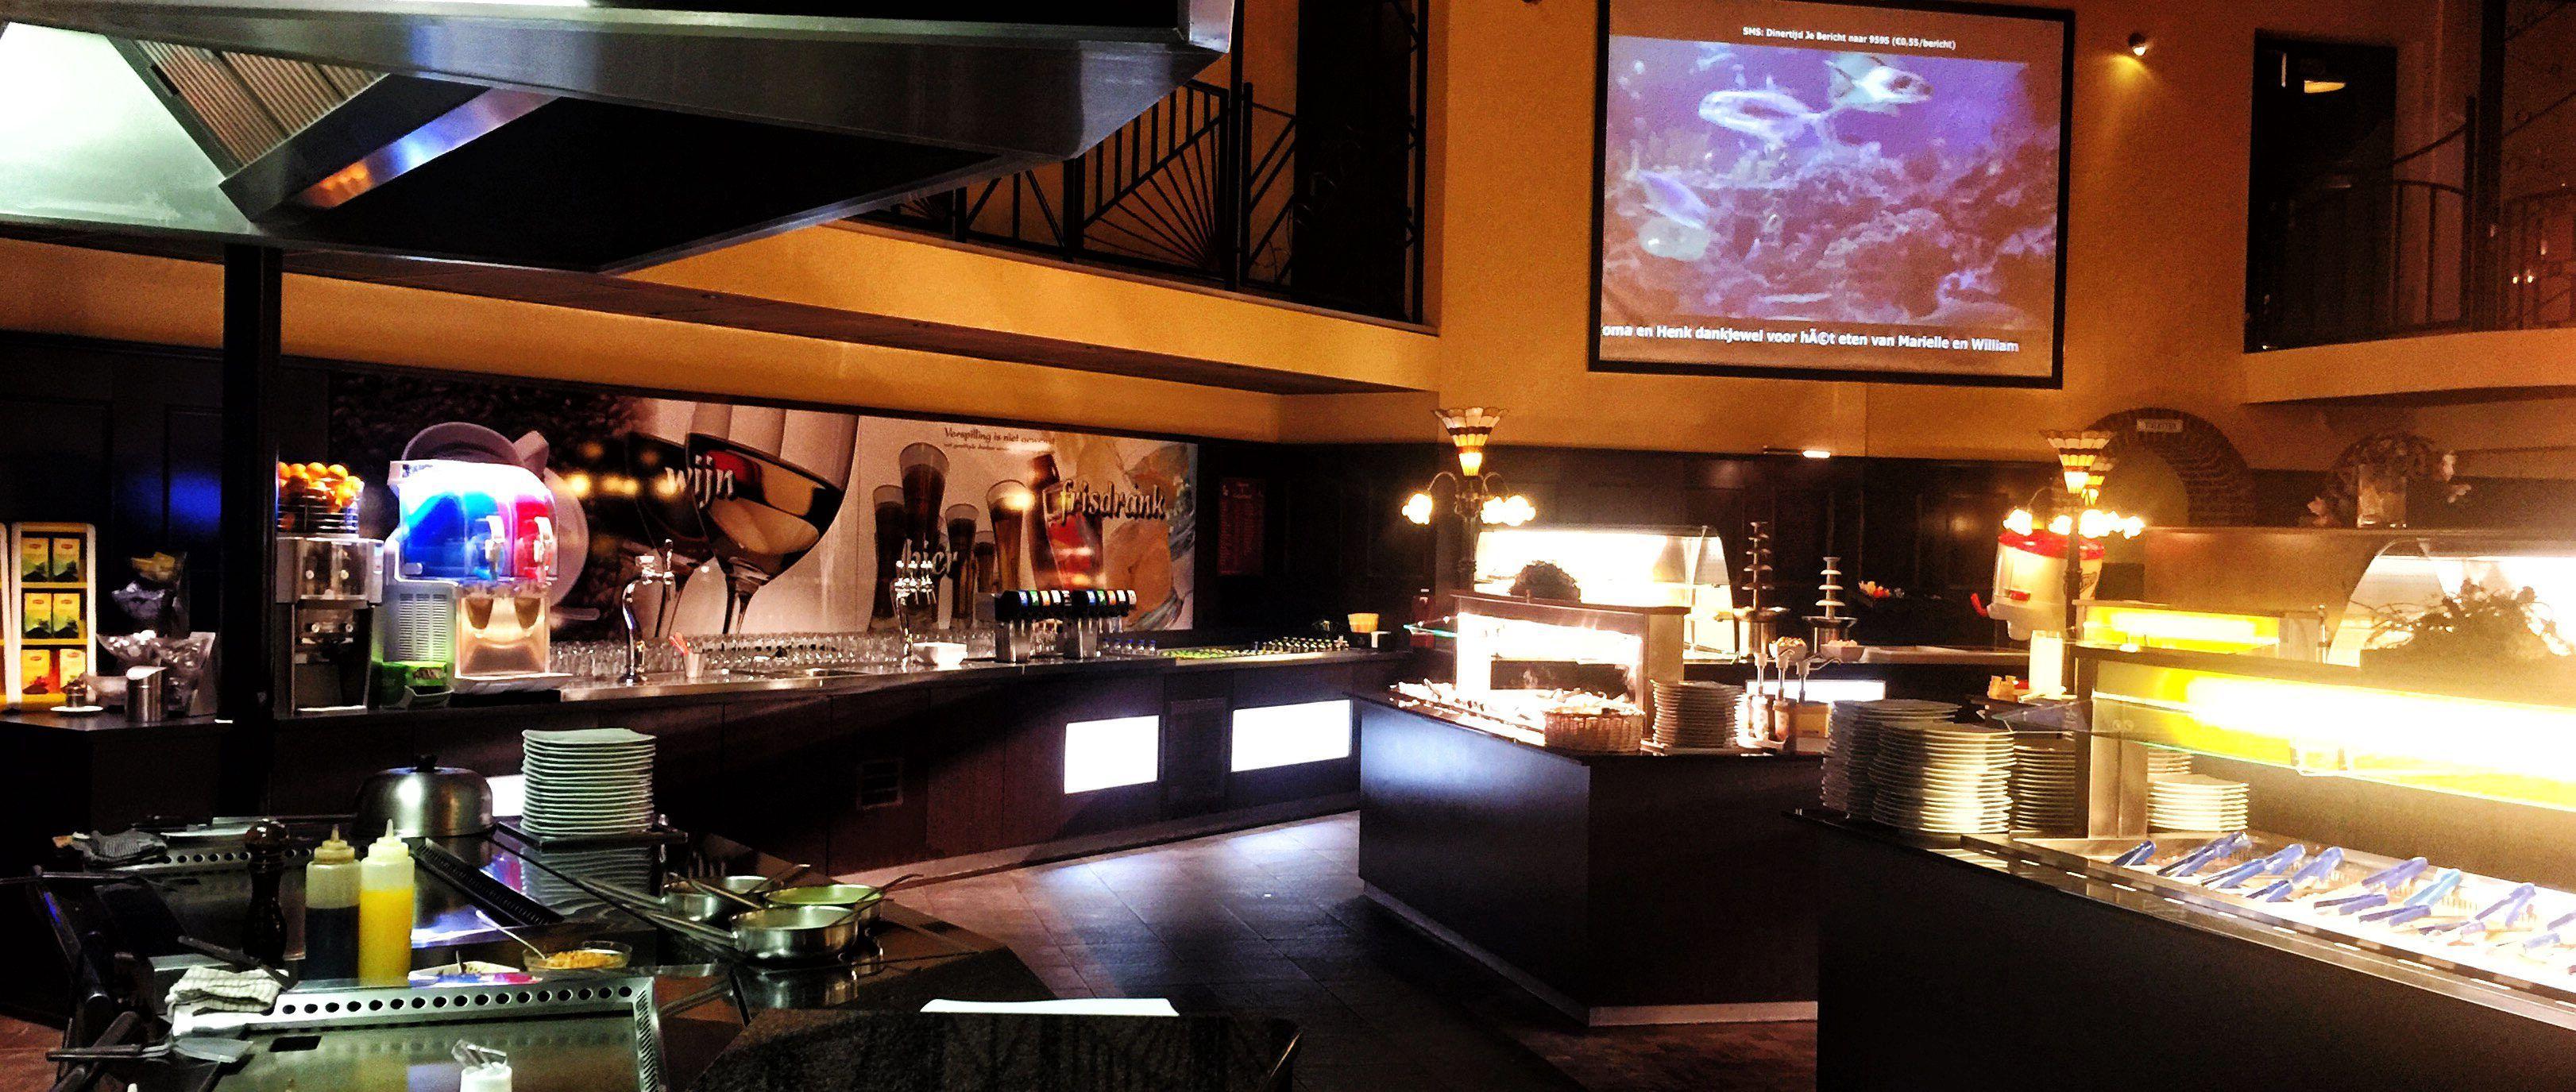 dinertijd-restaurant